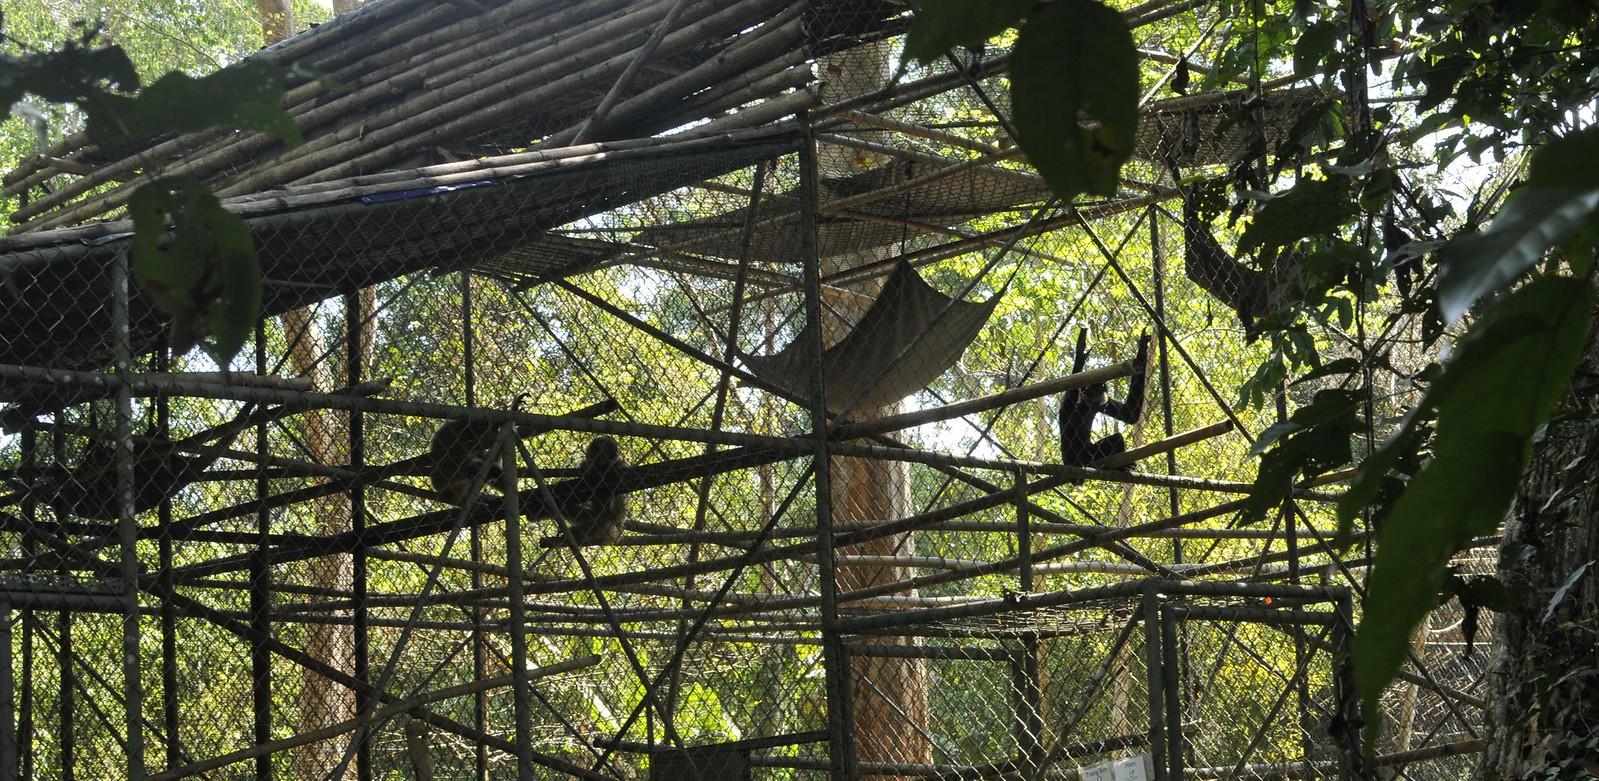 Primate Rehabilitation Center at Cat Tien National Park Vietnam